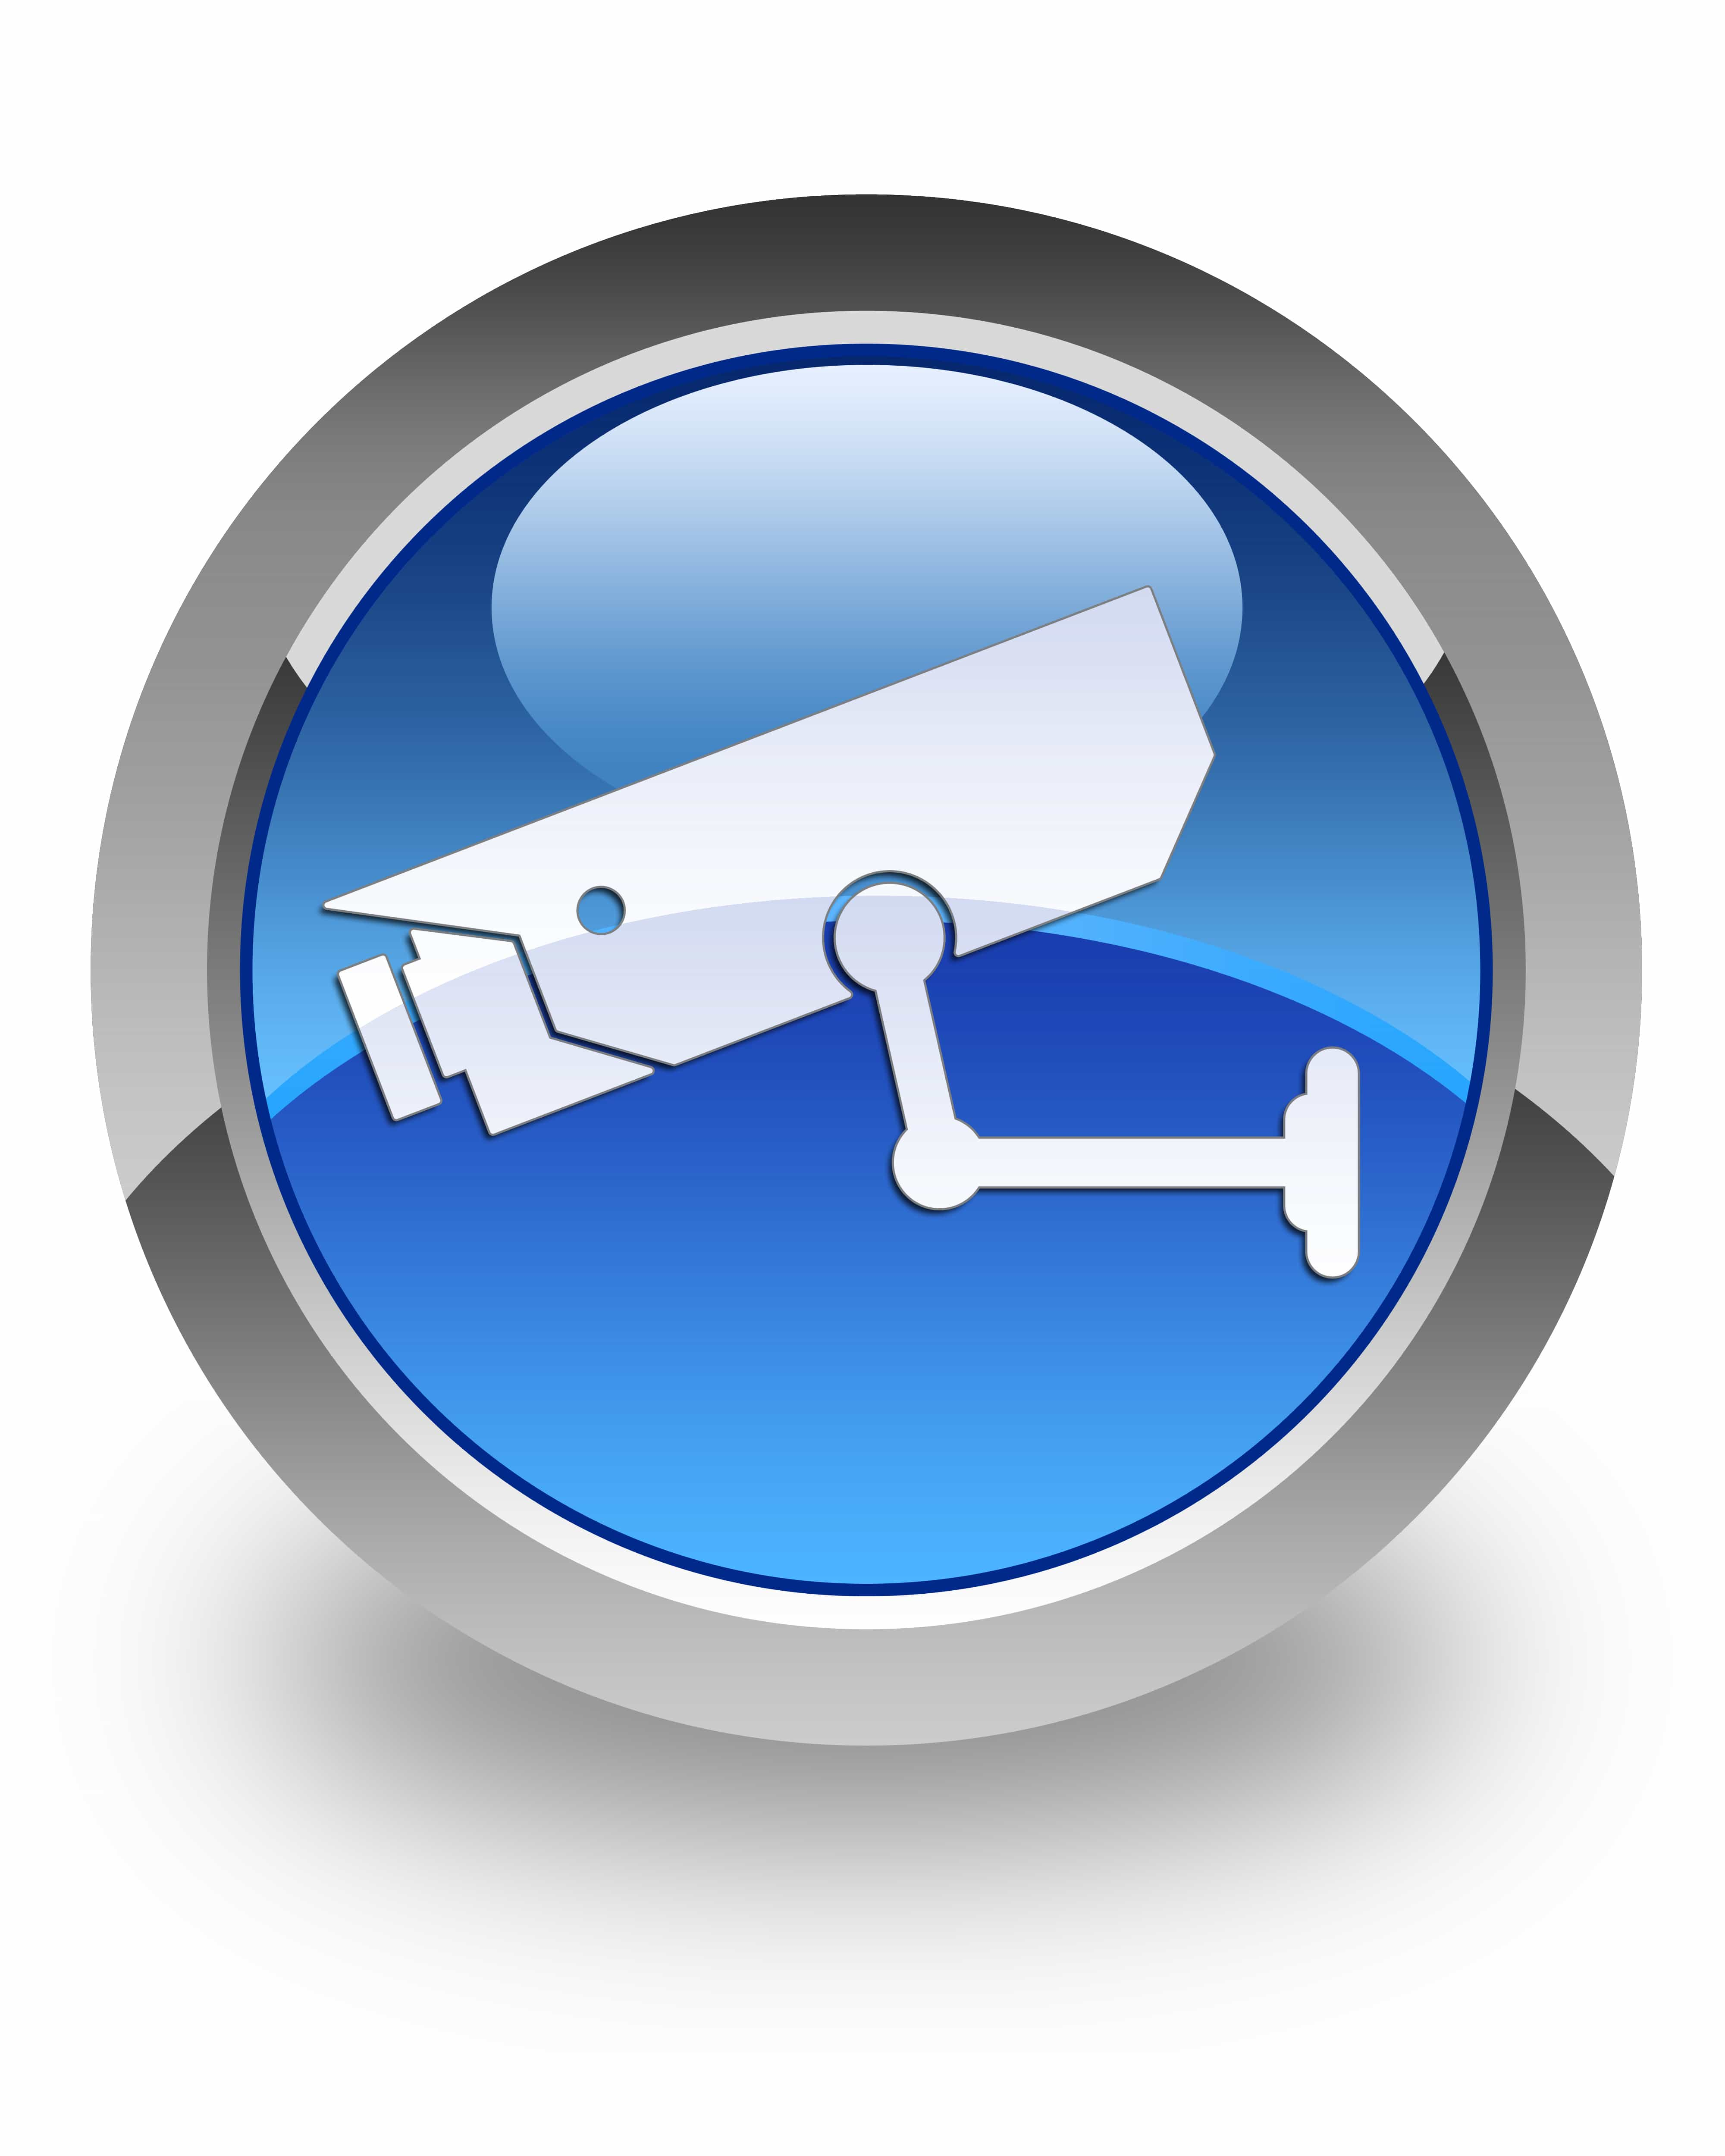 Camera alarme provinciale for Alarme maison montreal